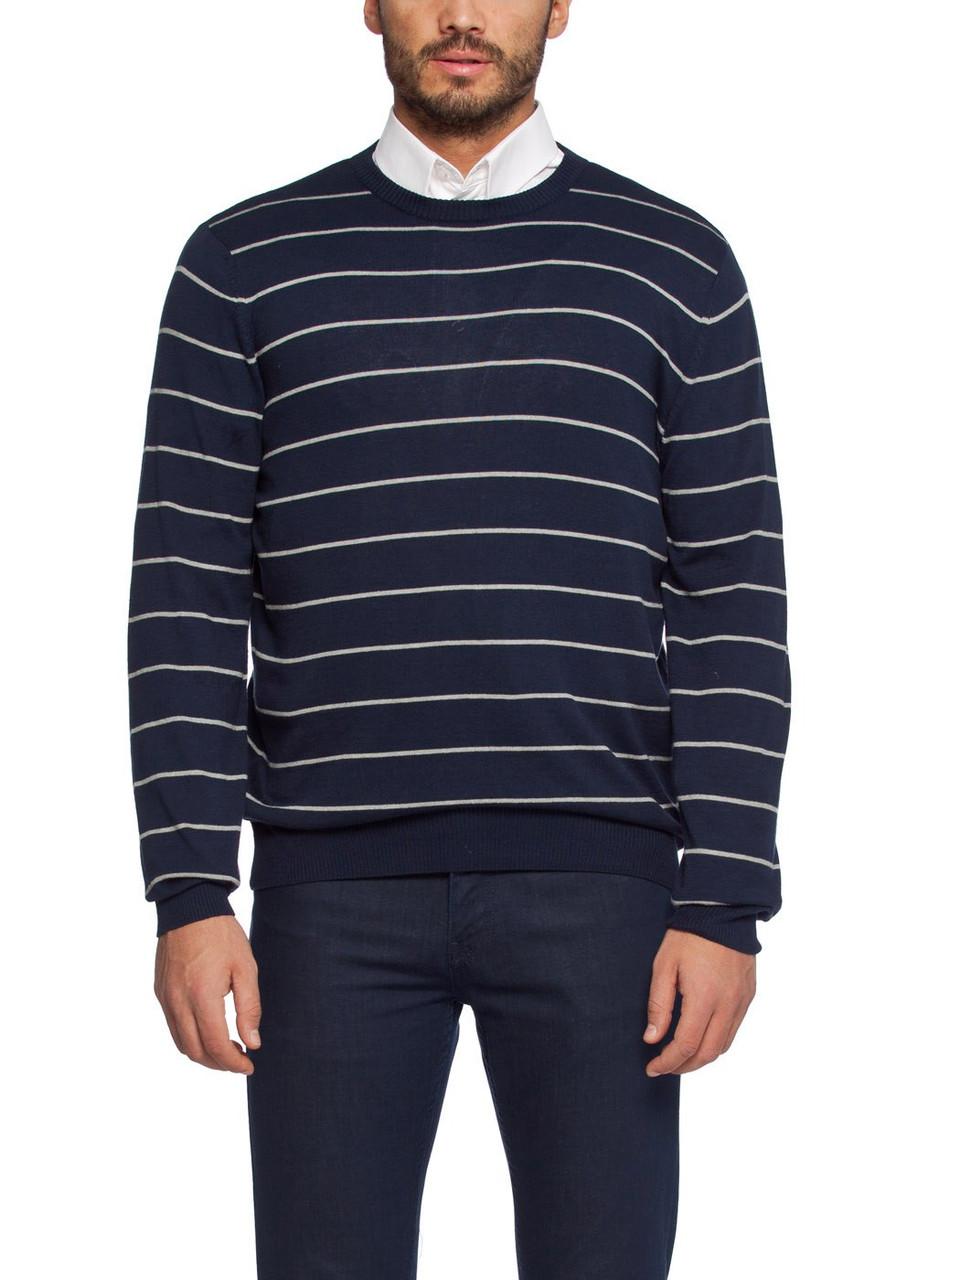 Мужской синий свитер LC Waikiki в белые полоски